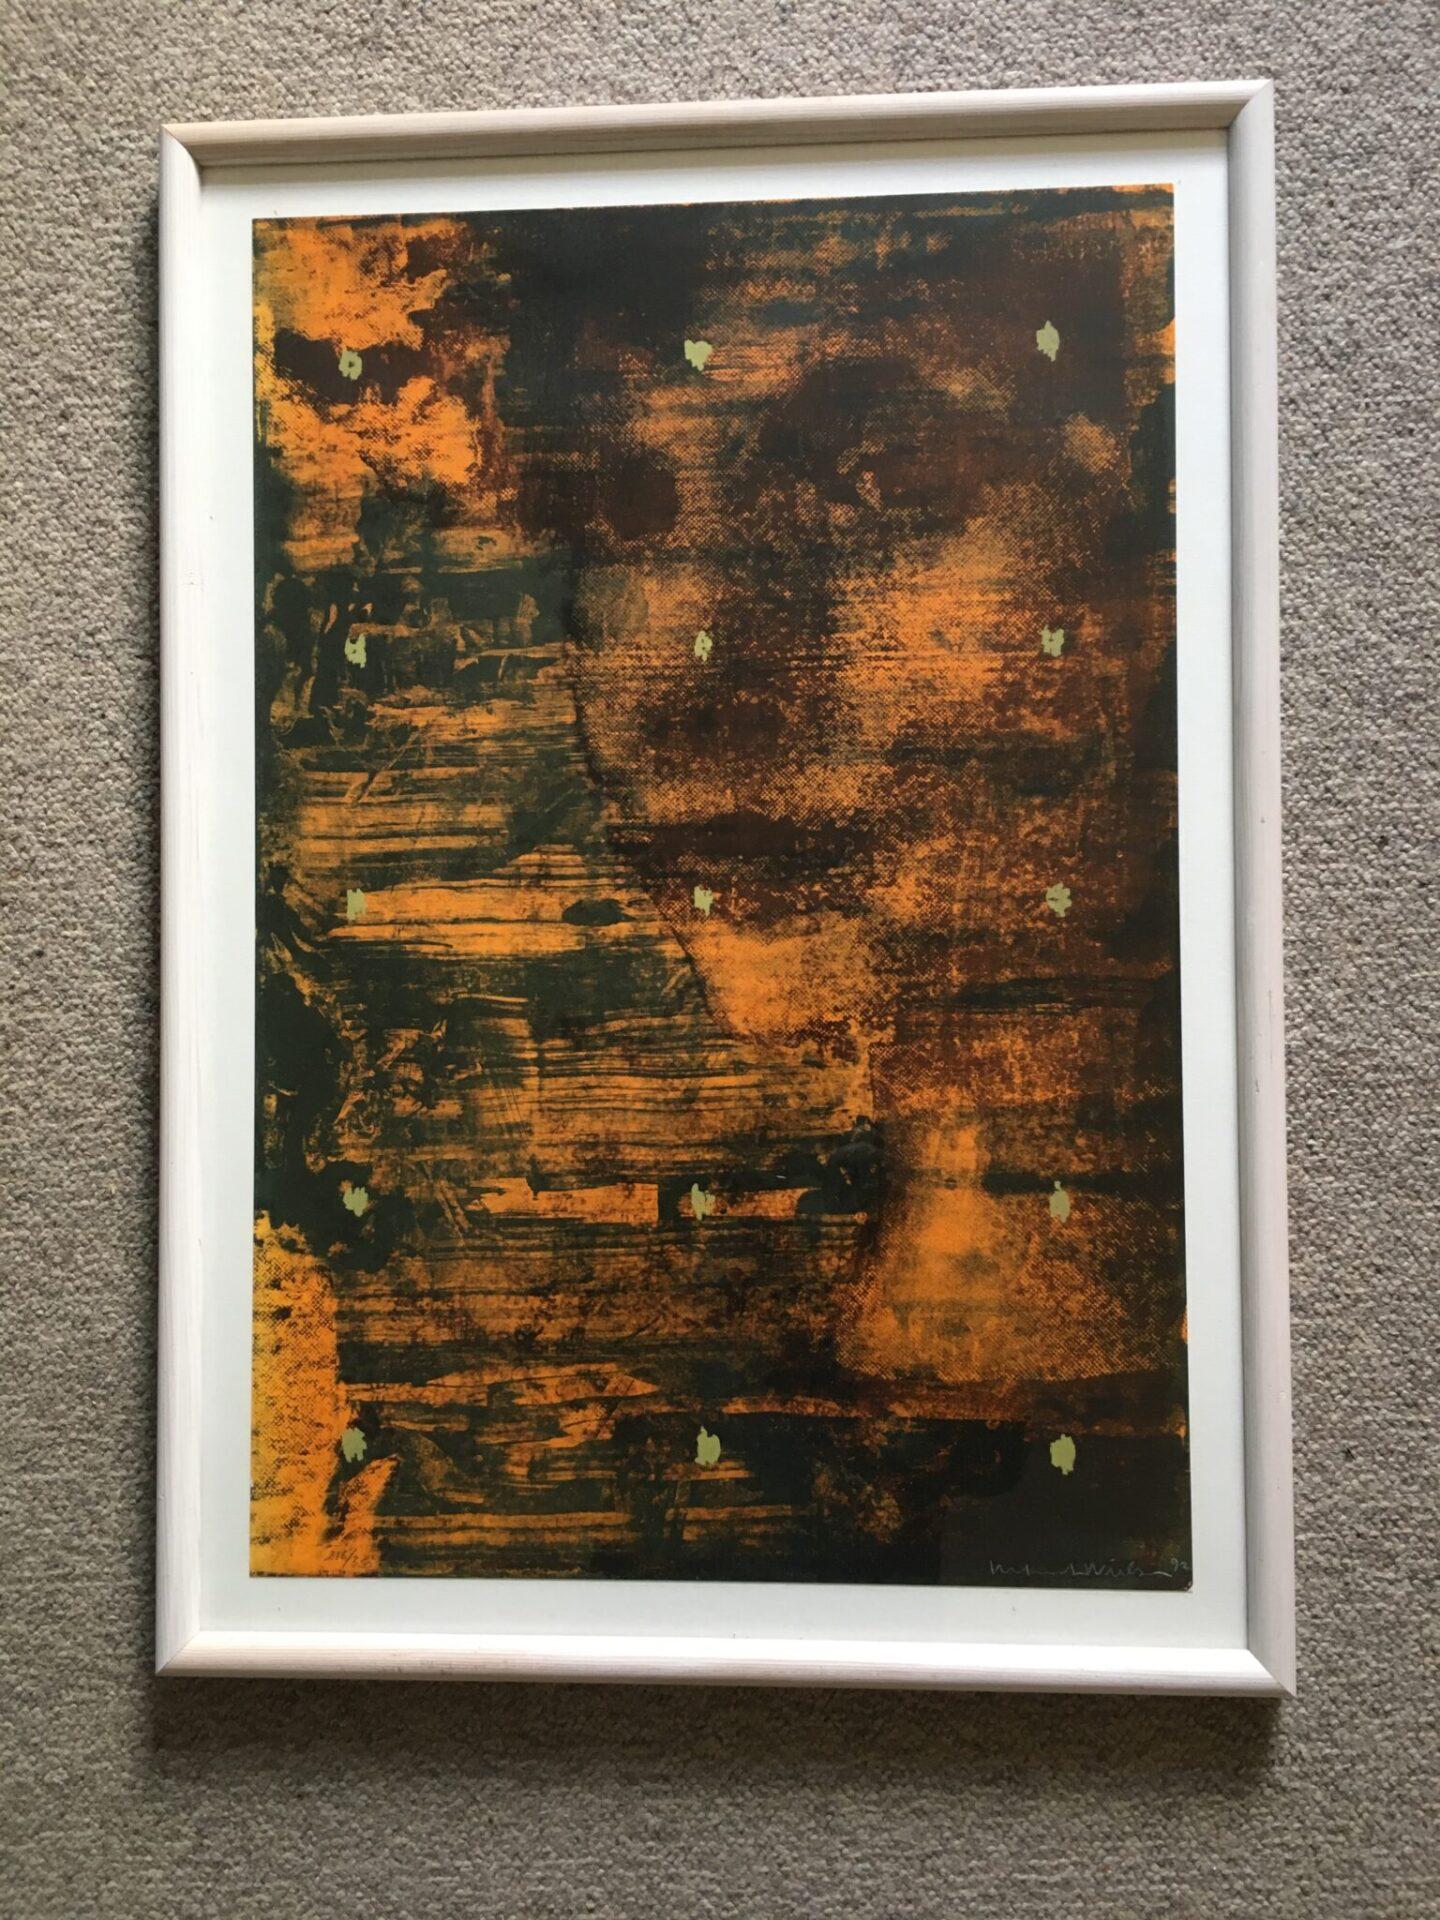 Kenneth Nielsen, Litografi nr. 216/350, signetert i 92, rammemål 72x50 cm, pris 300 kr